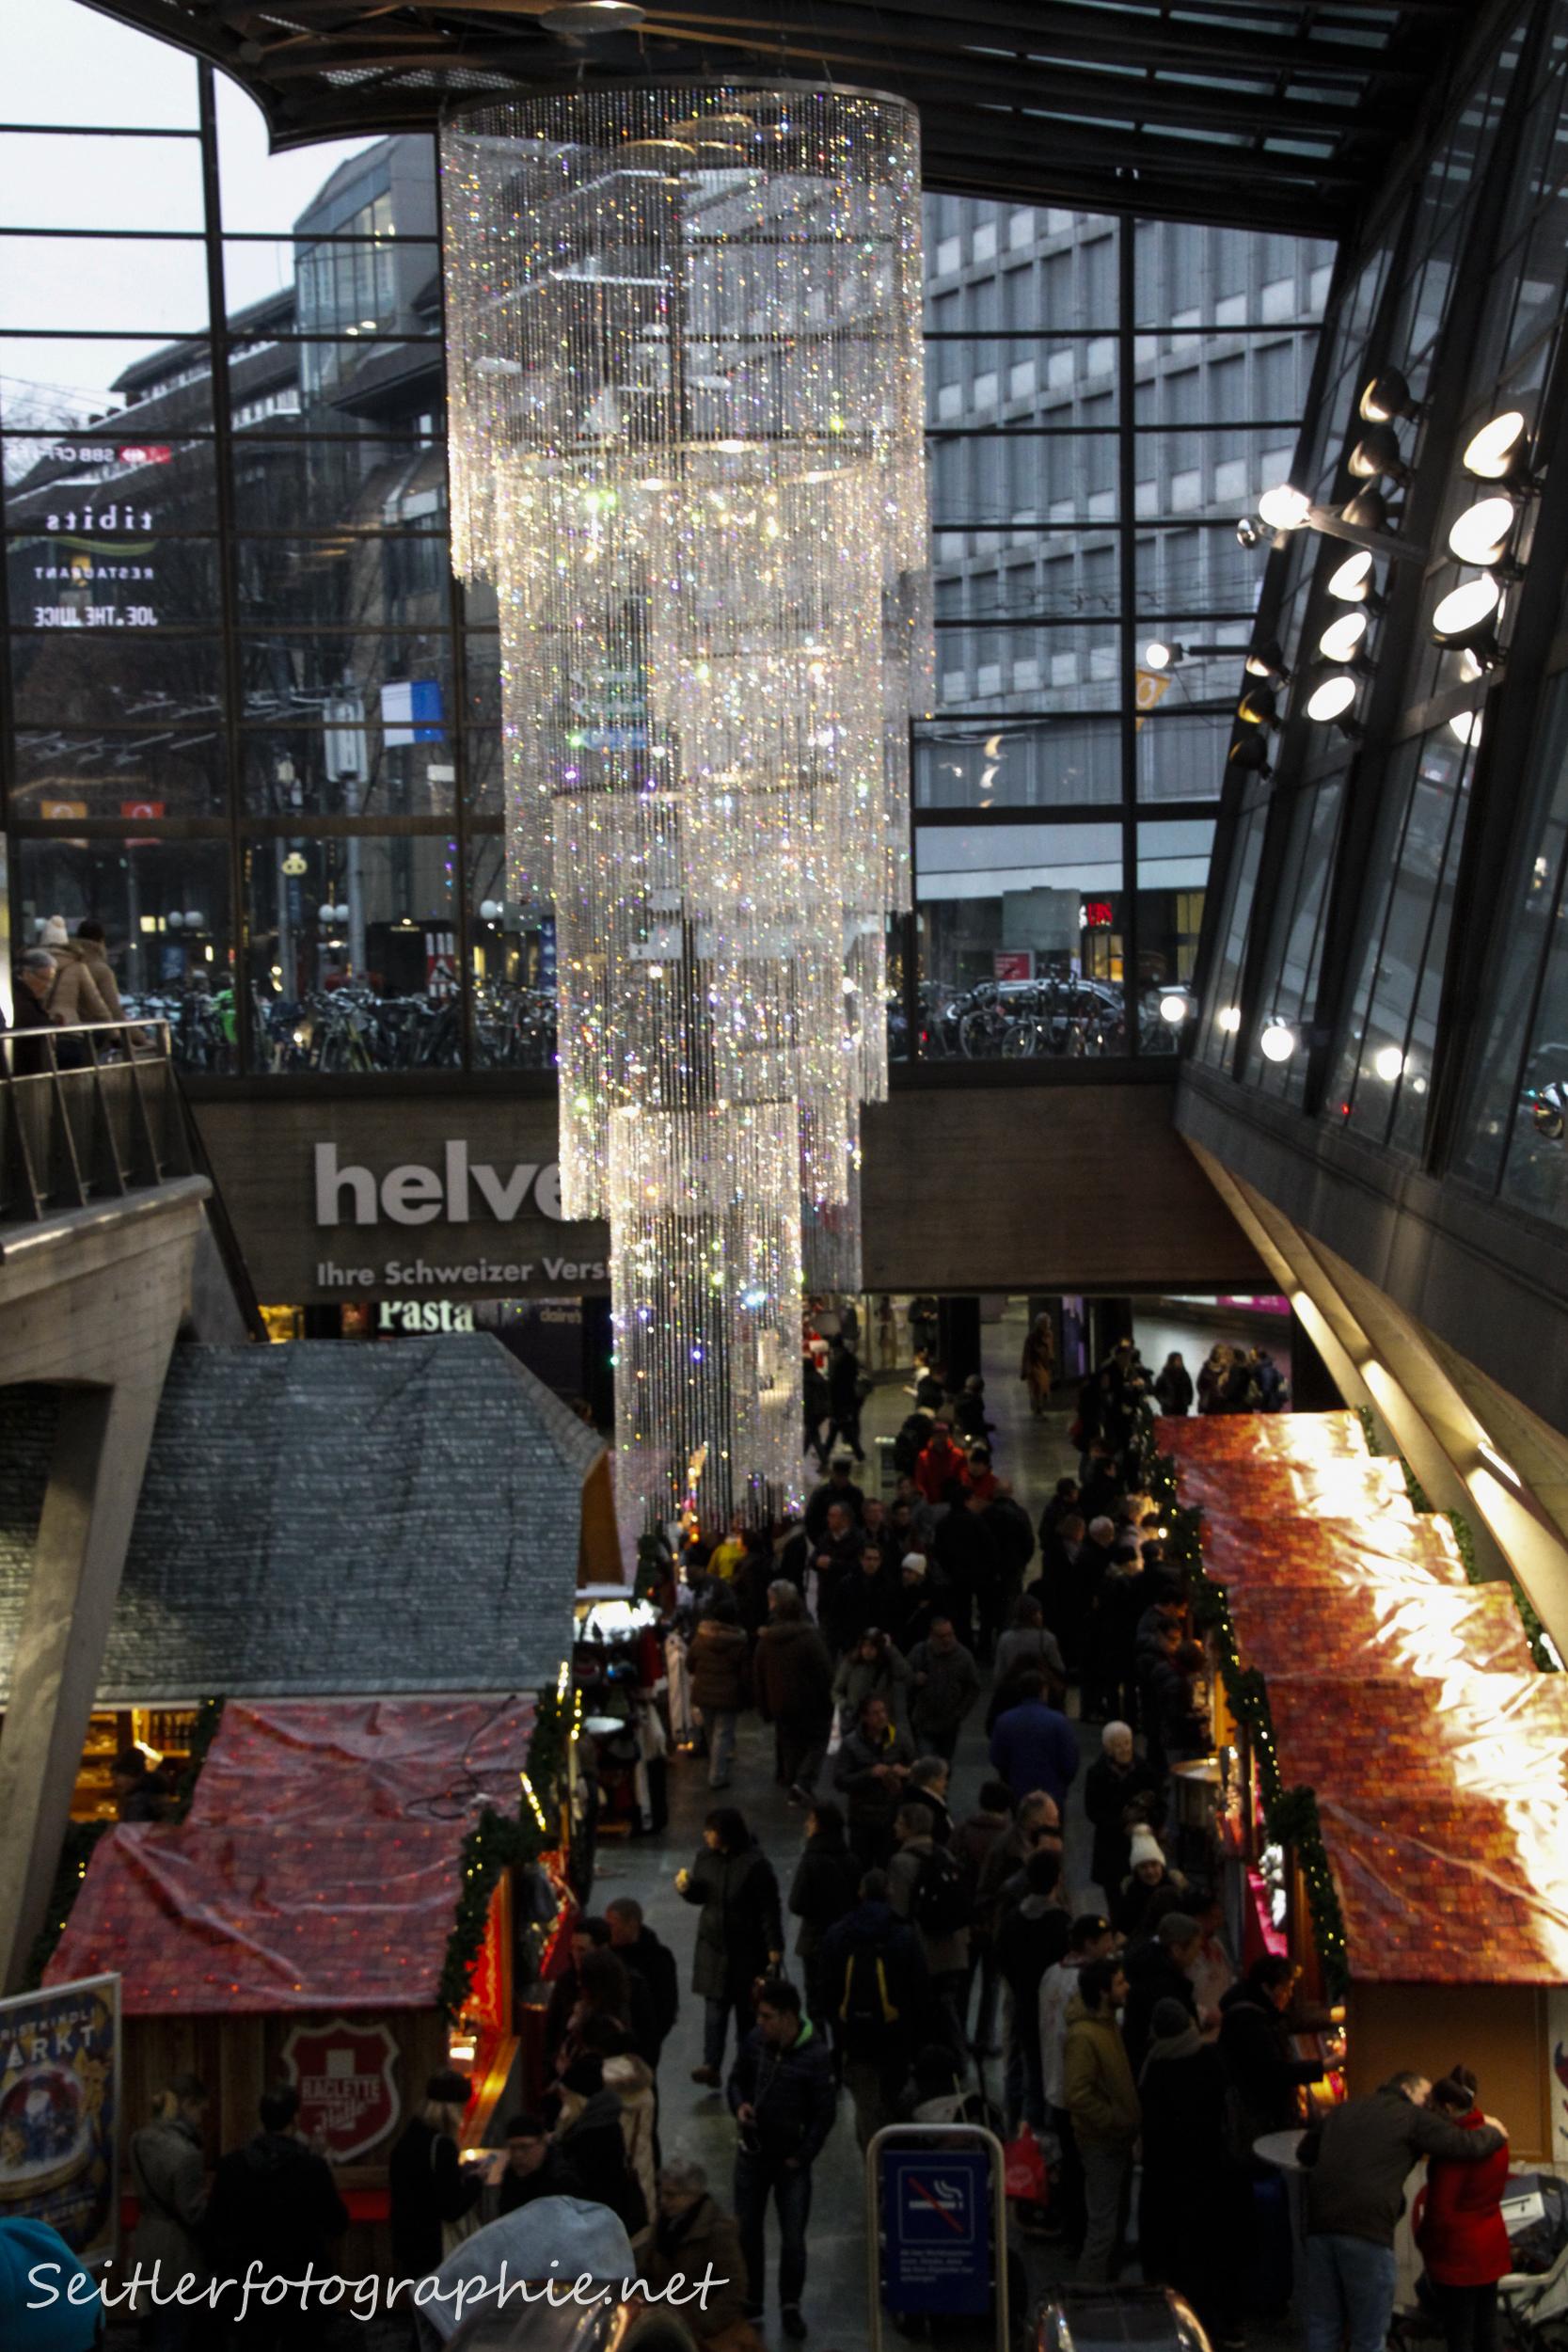 20161127_weihnachtsmarkt_joannarutkoseitler_1